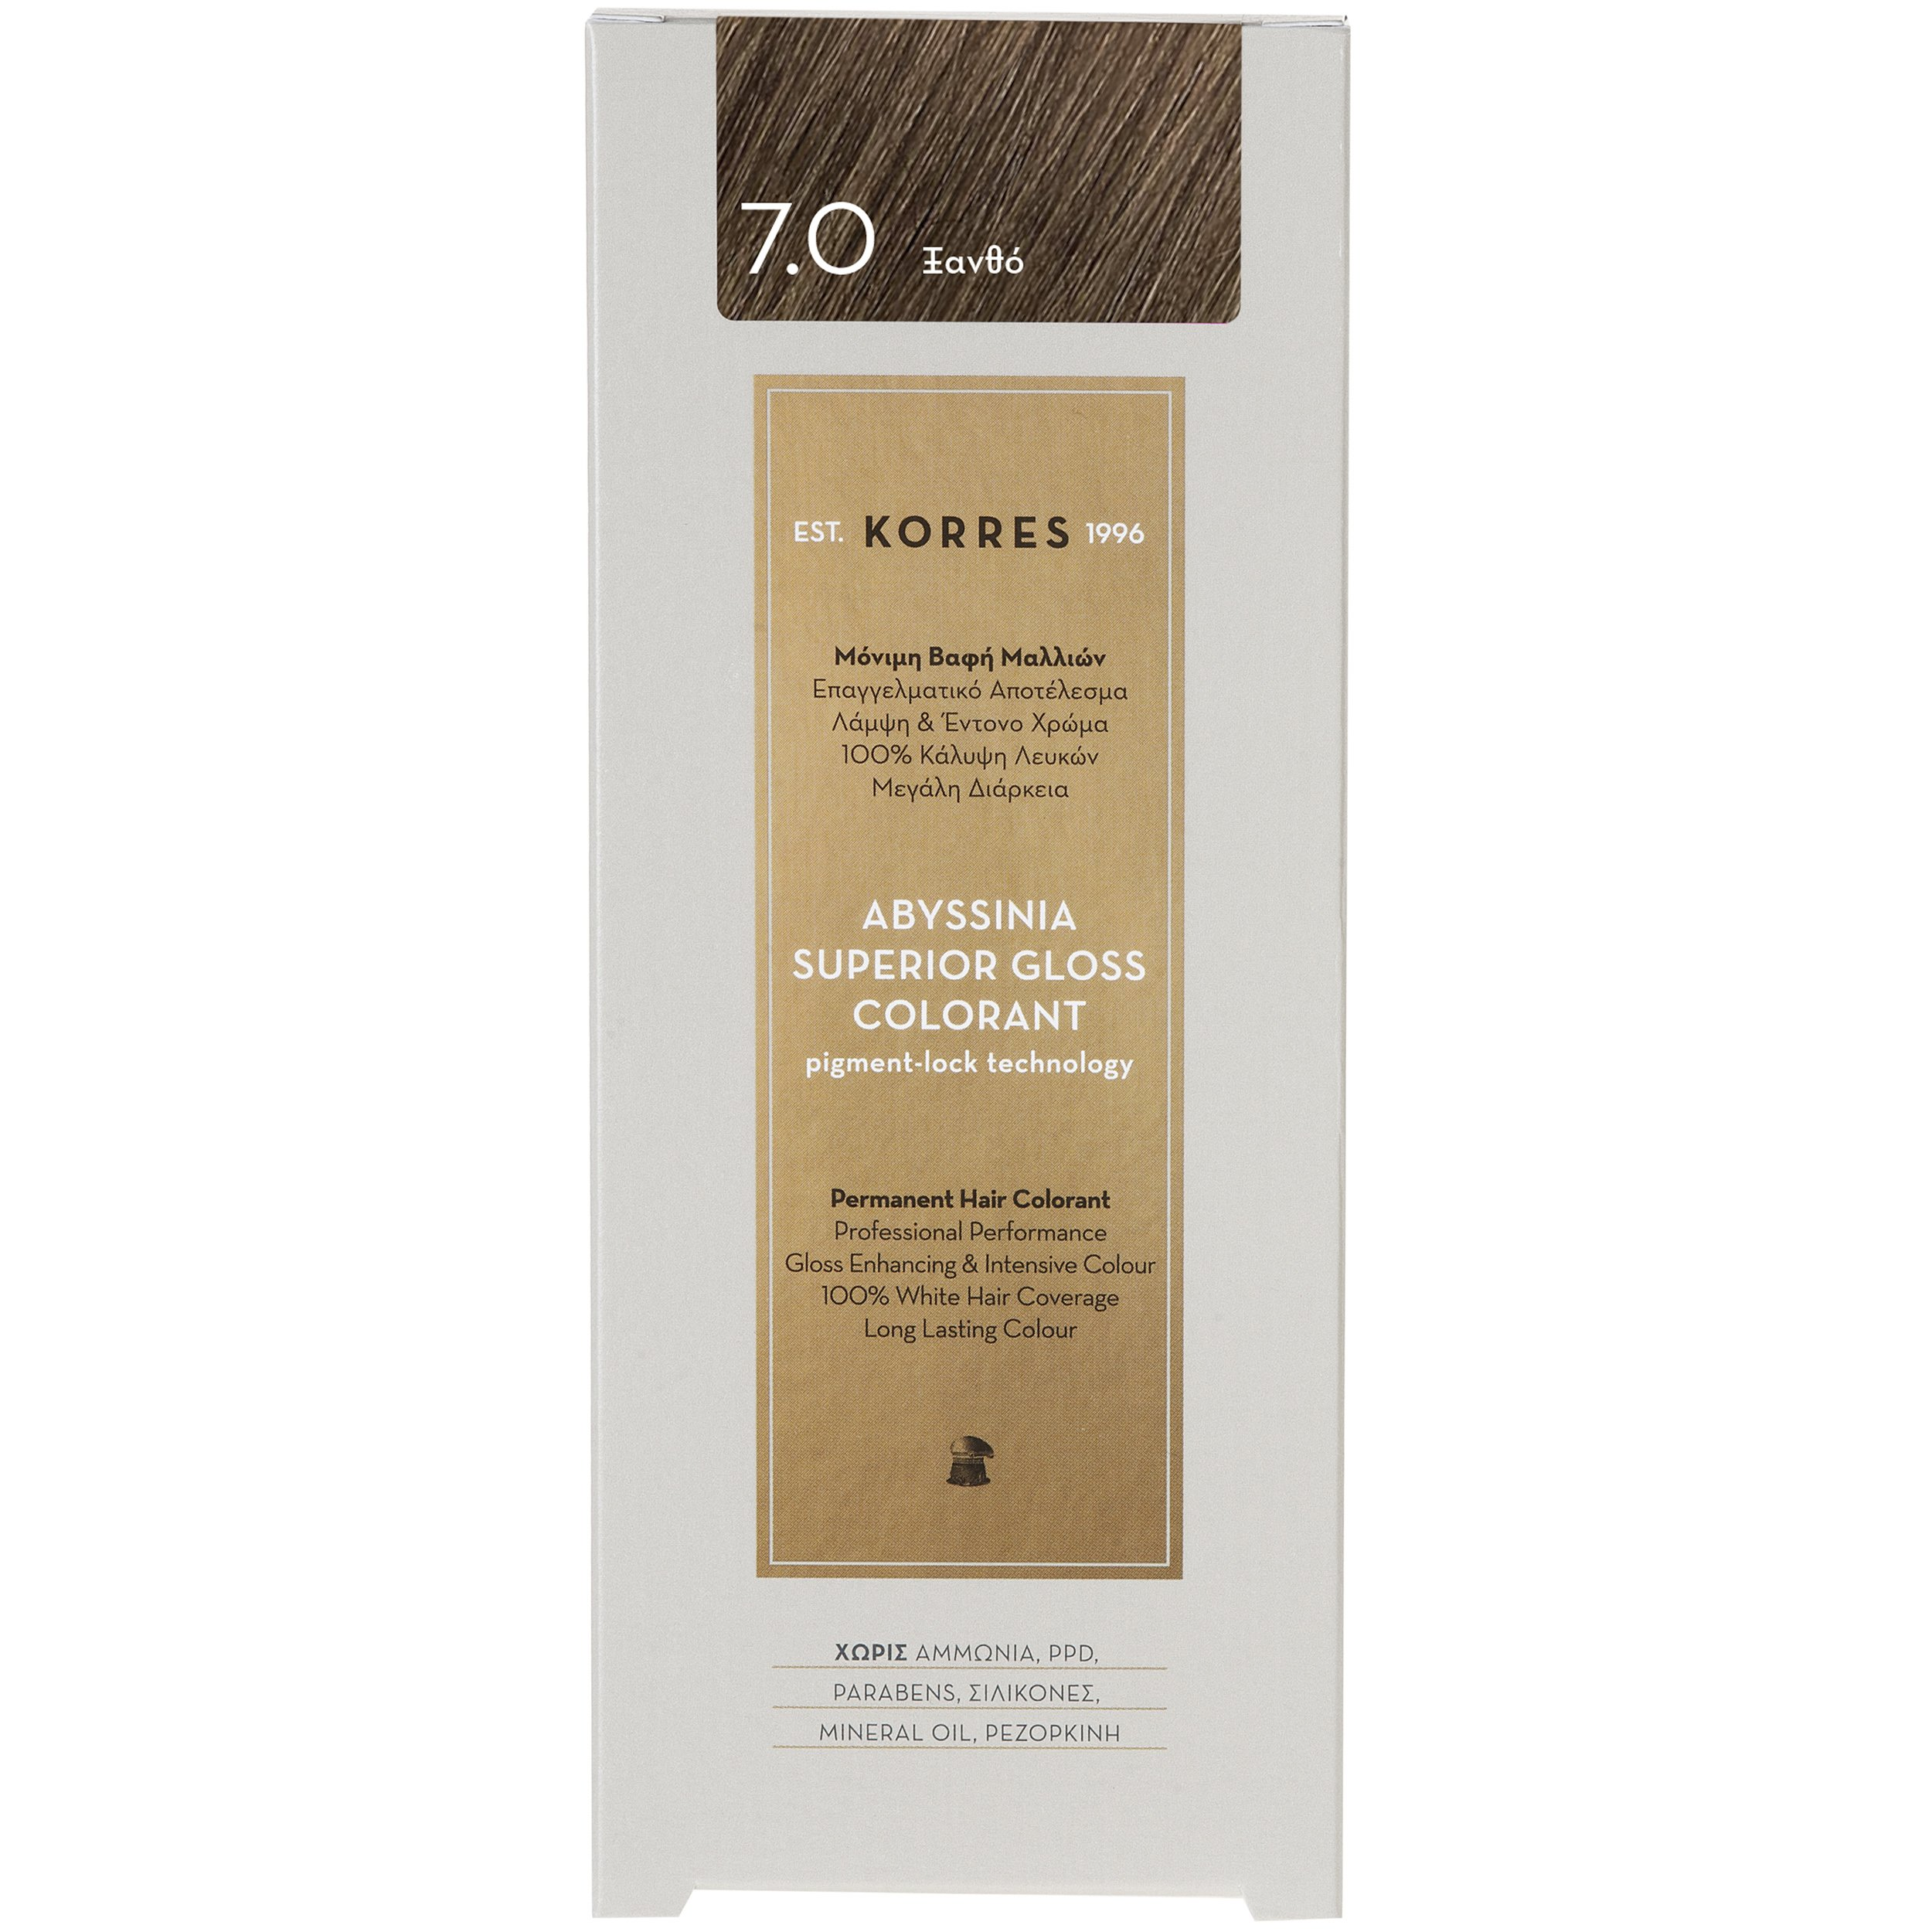 Korres Abyssinia Superior Gloss Colorant Επαγγελματικό Αποτέλεσμα Λάμψη & Έντονο Χρώμα – 7.0 ΞΑΝΘΟ